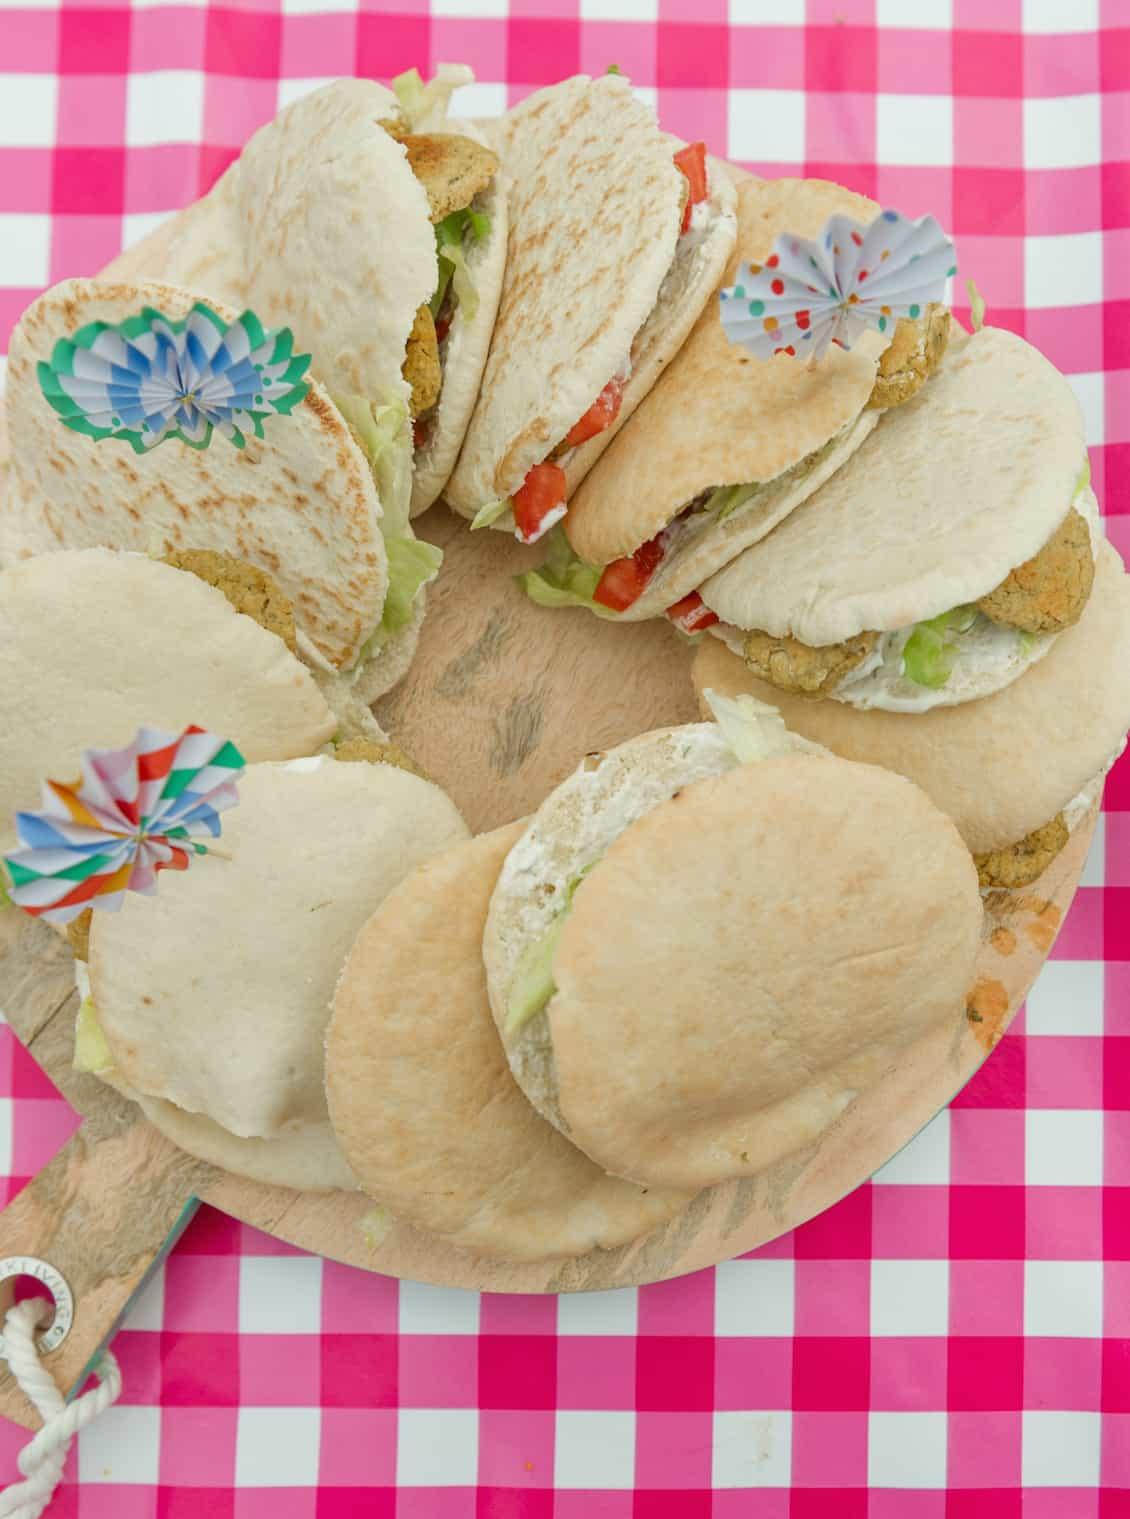 broodjes-falafel-met-knoflooksaus-2